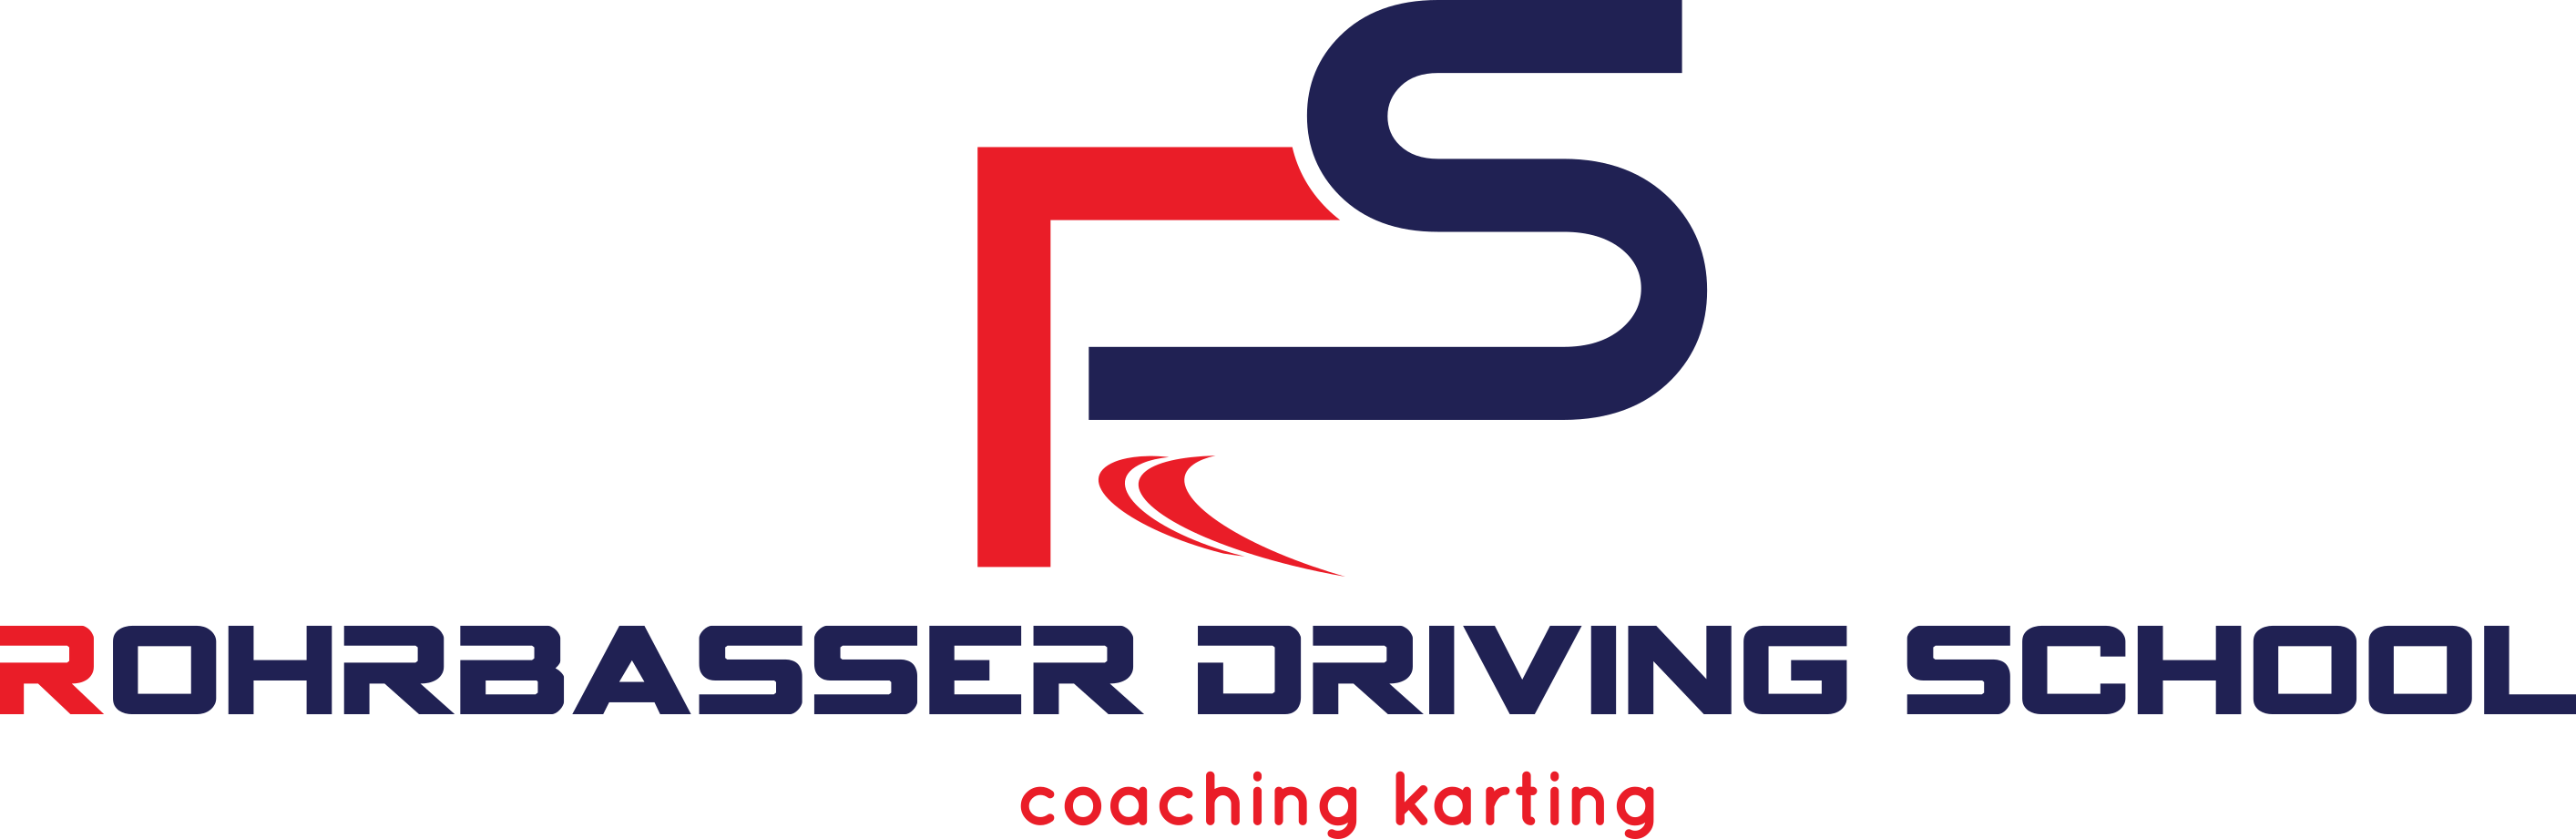 logo rohrbasser driving school